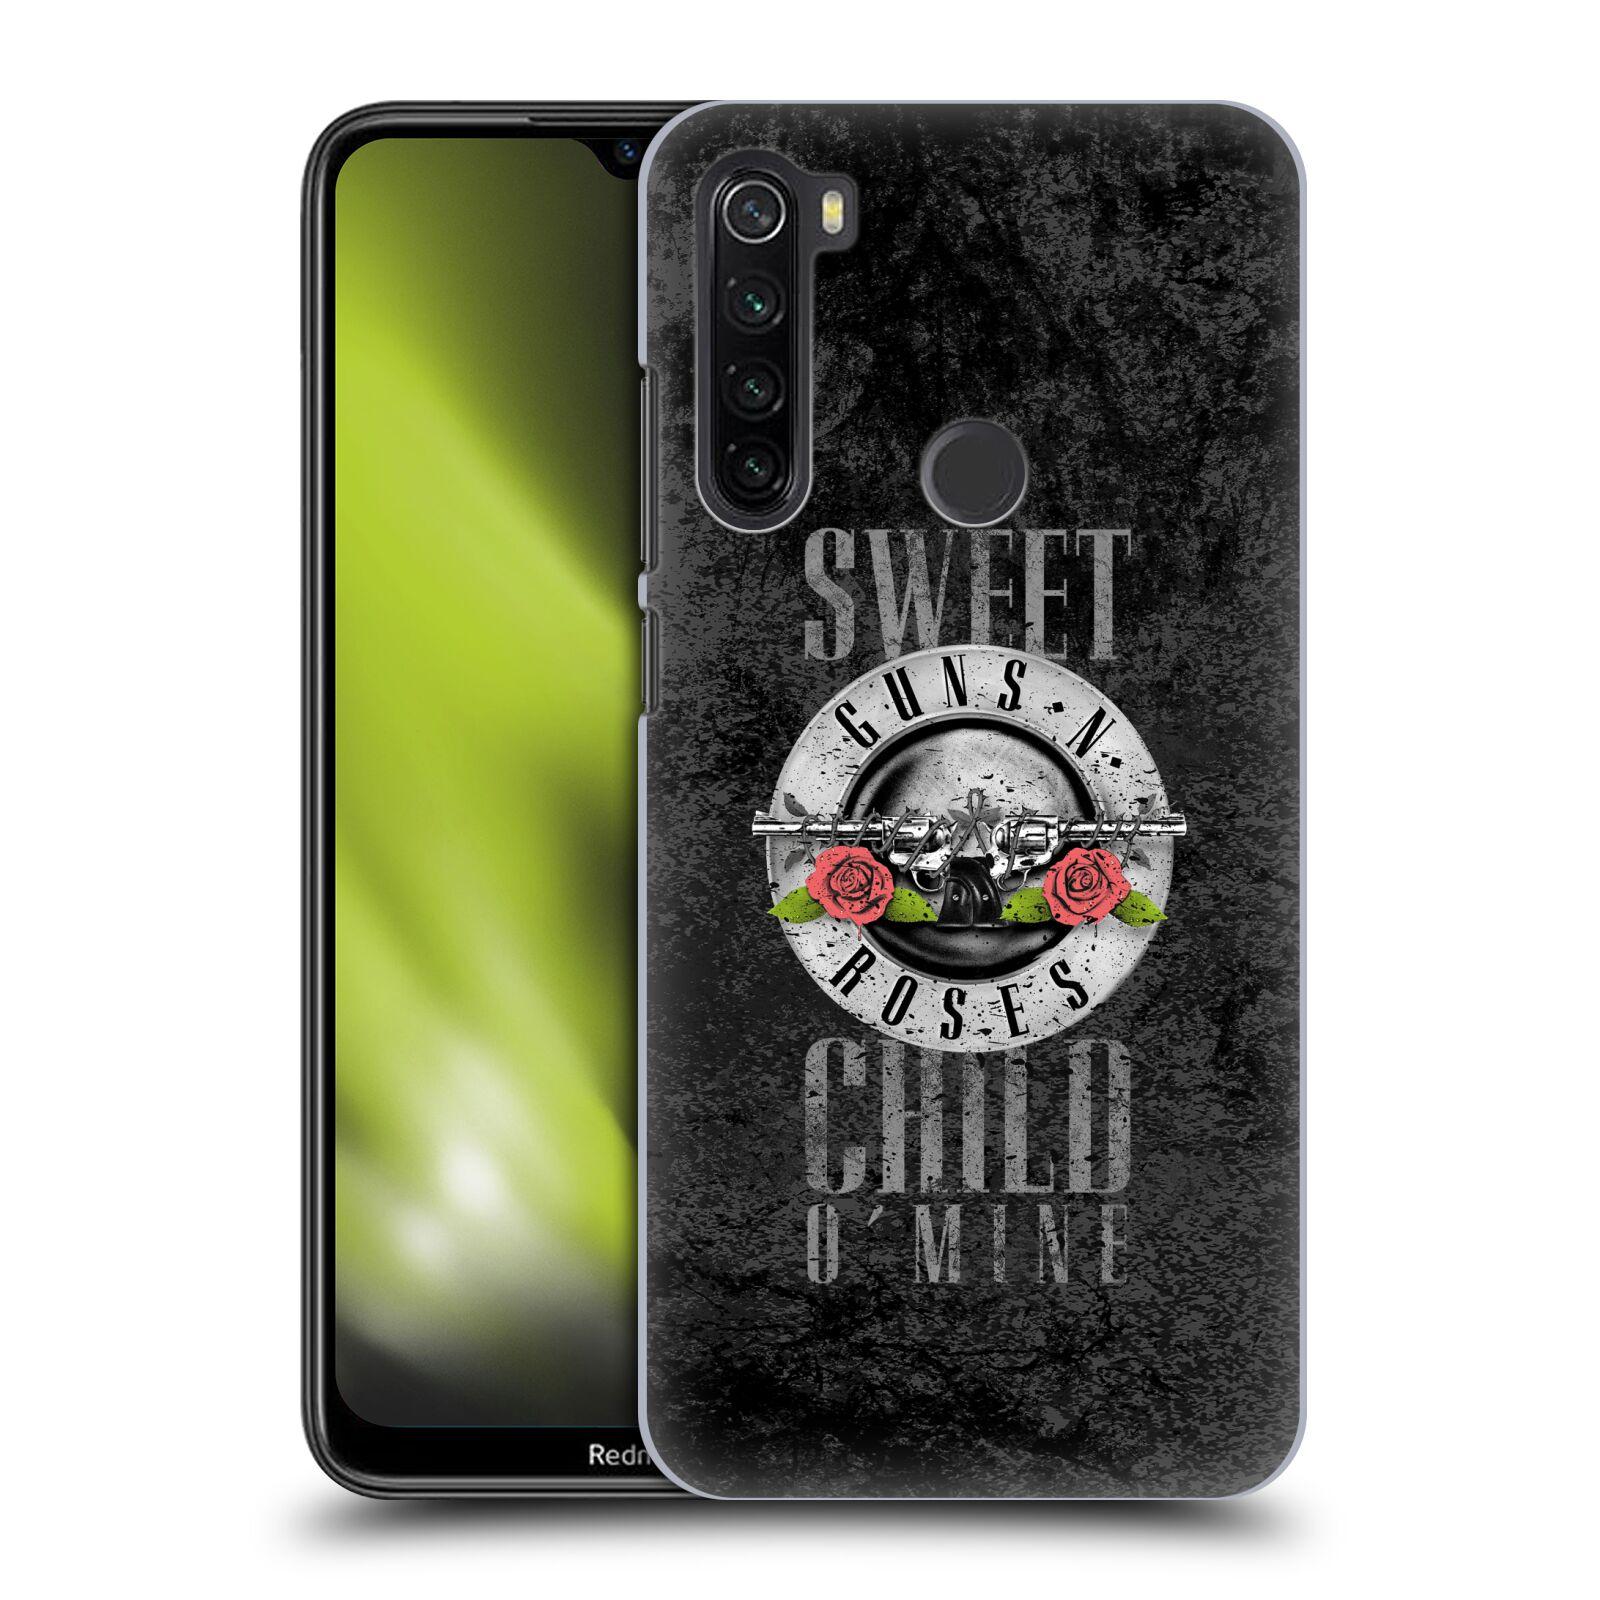 Plastové pouzdro na mobil Xiaomi Redmi Note 8T - Head Case - Guns N' Roses - Sweet Child